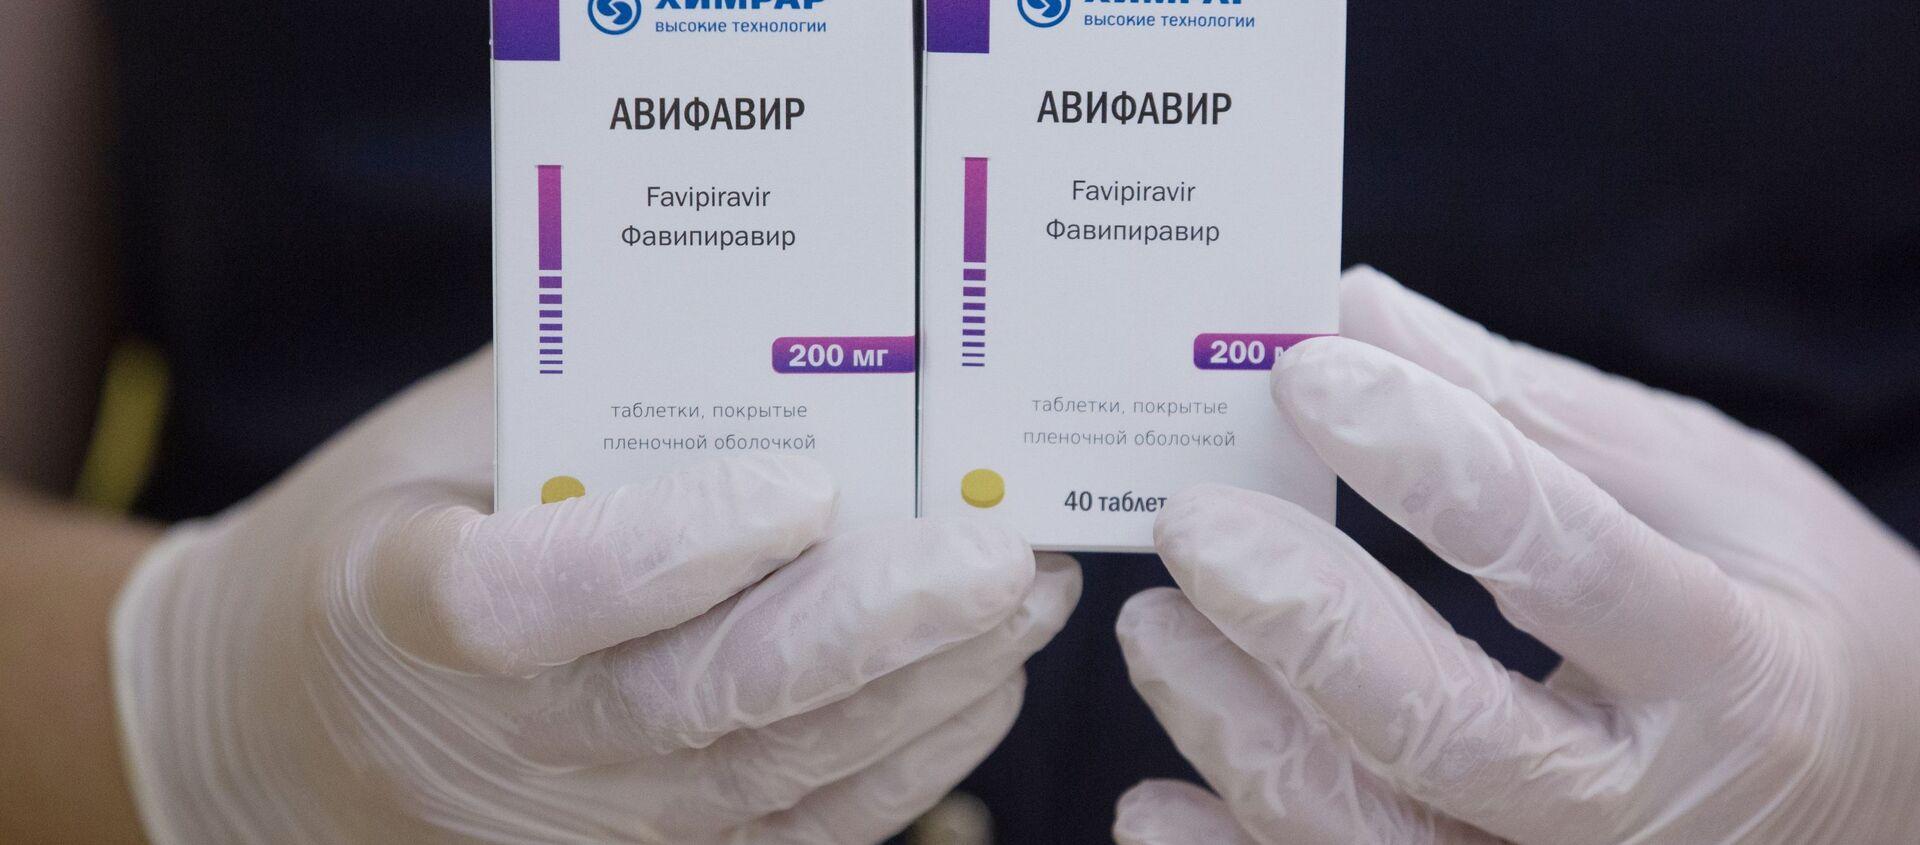 Avifavir, medicamento producido en Rusia para combatir el coronavirus - Sputnik Mundo, 1920, 01.02.2021